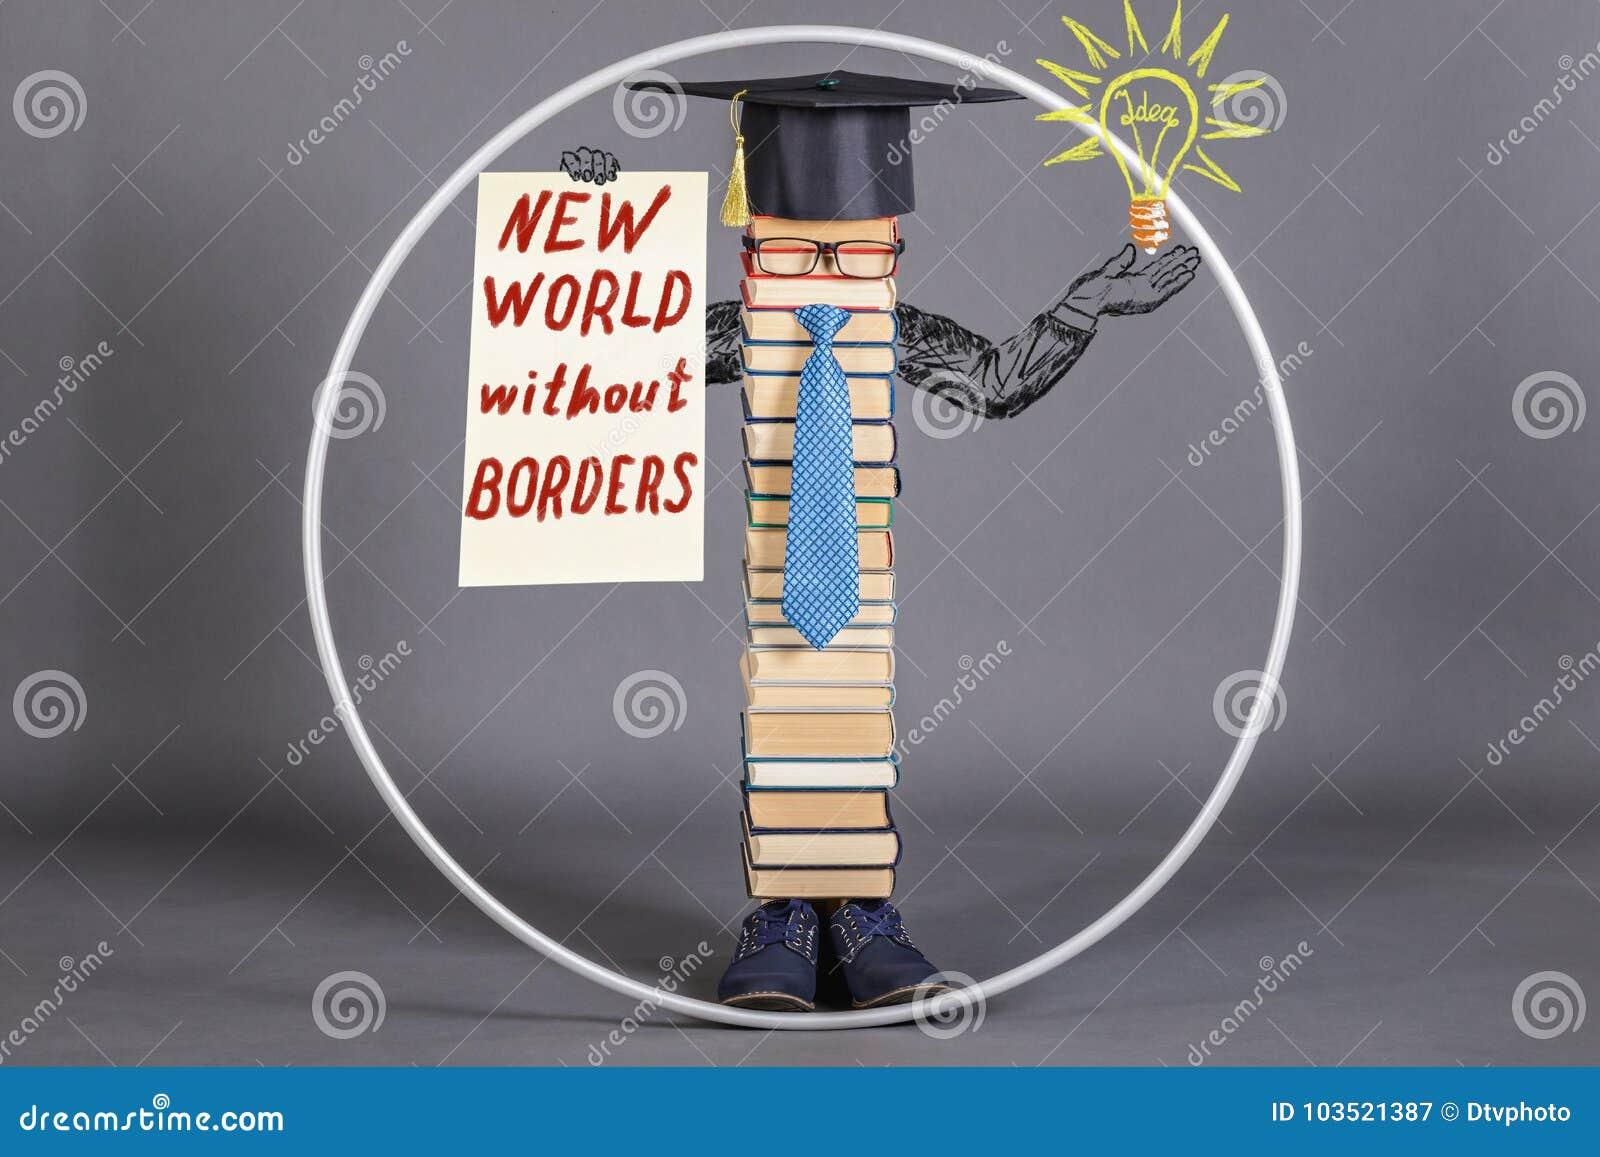 Modern educated intelligent man Vitruvian with a statement about